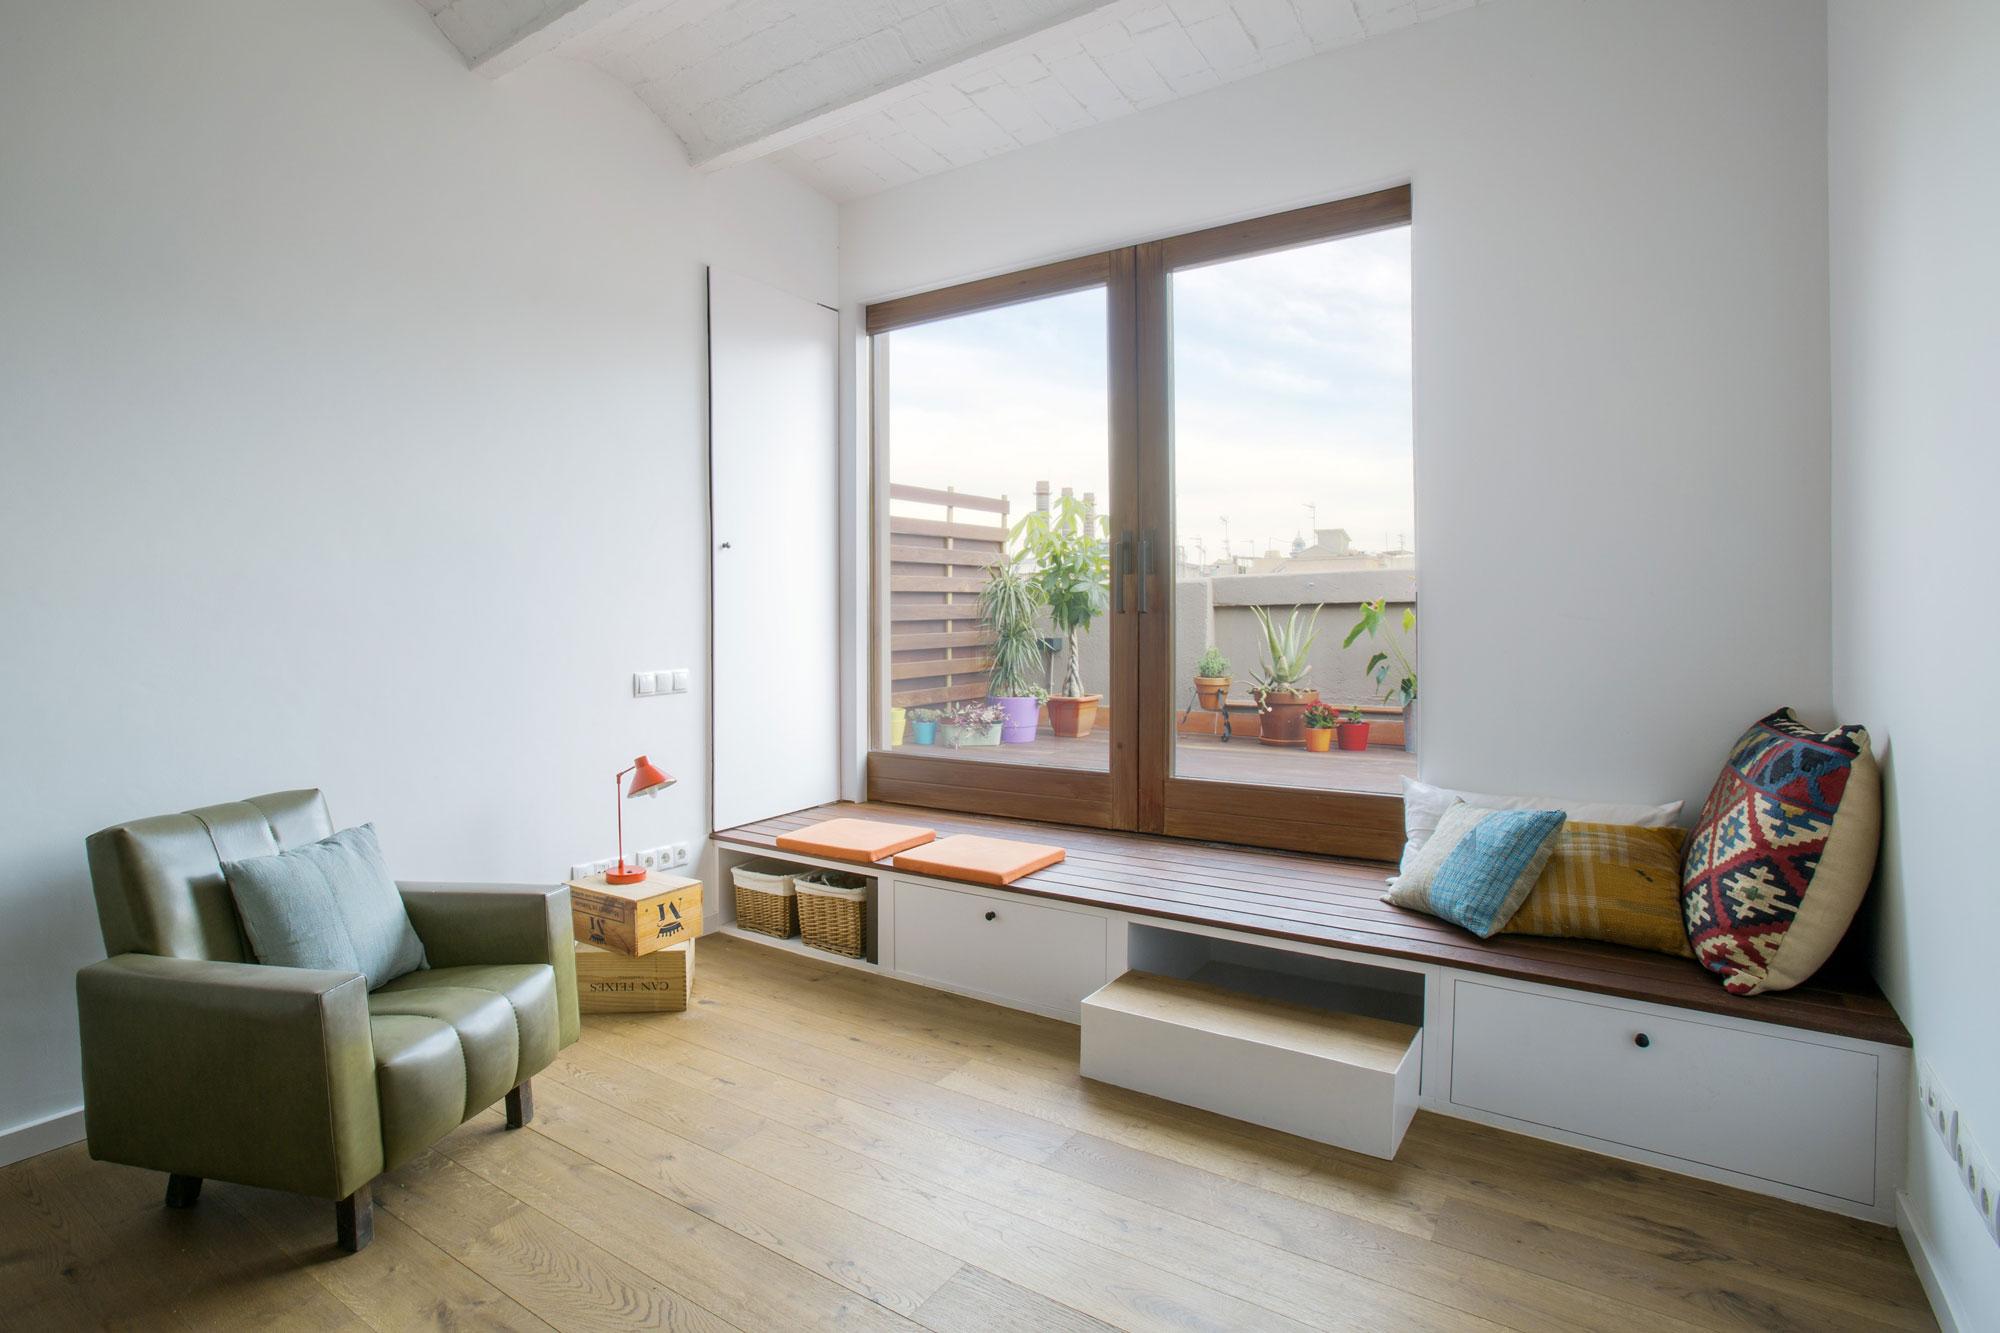 Window-seat-with-simplistic-design-